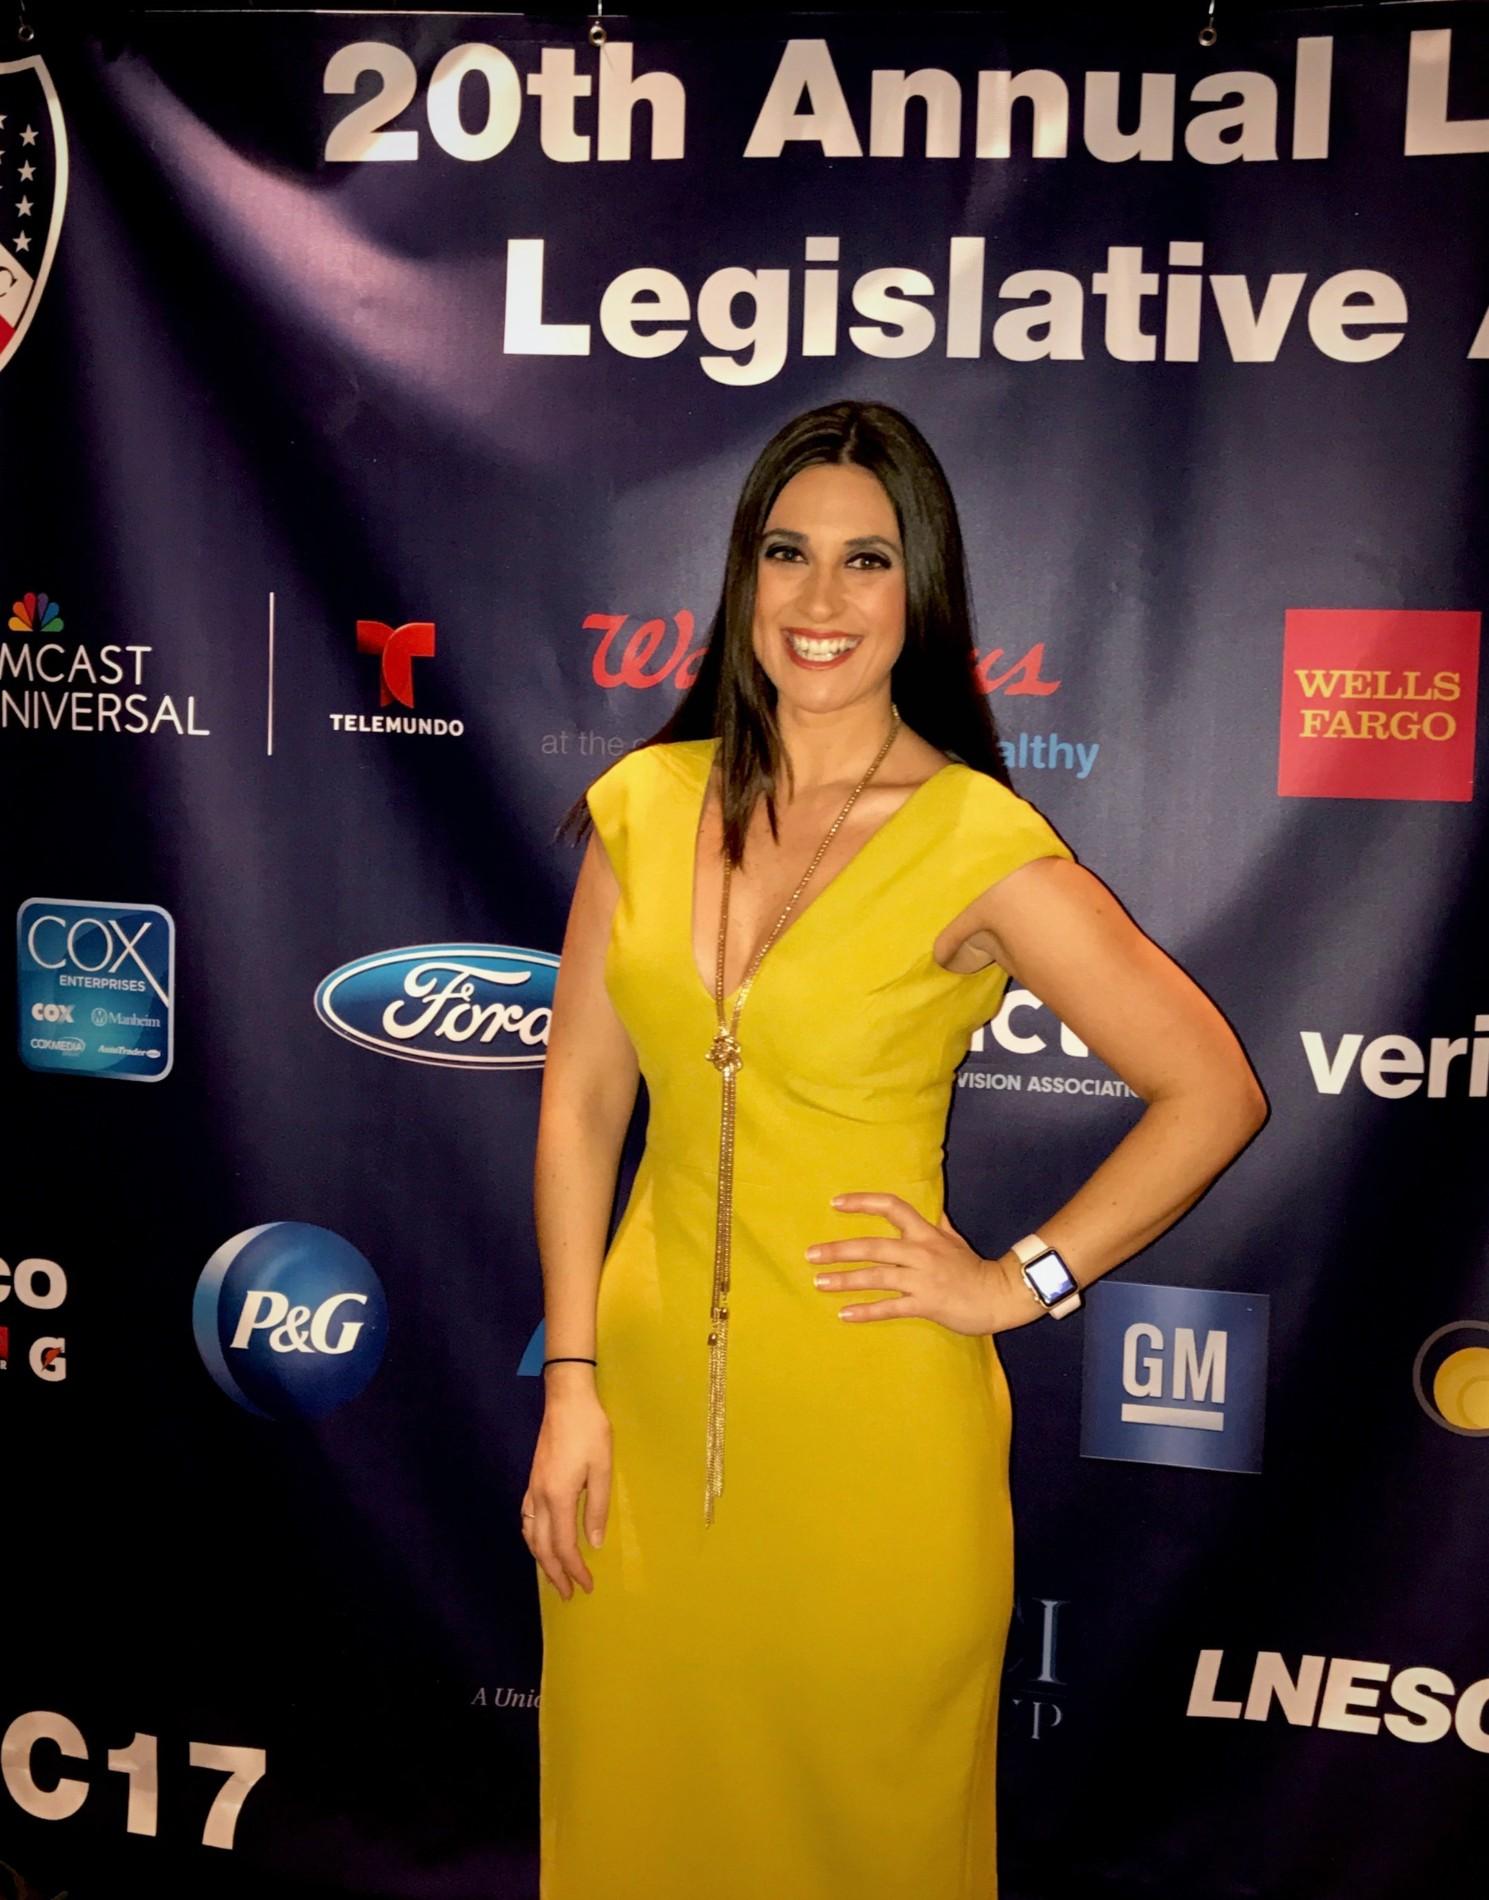 At the 20th Annual Legislative LULAC event